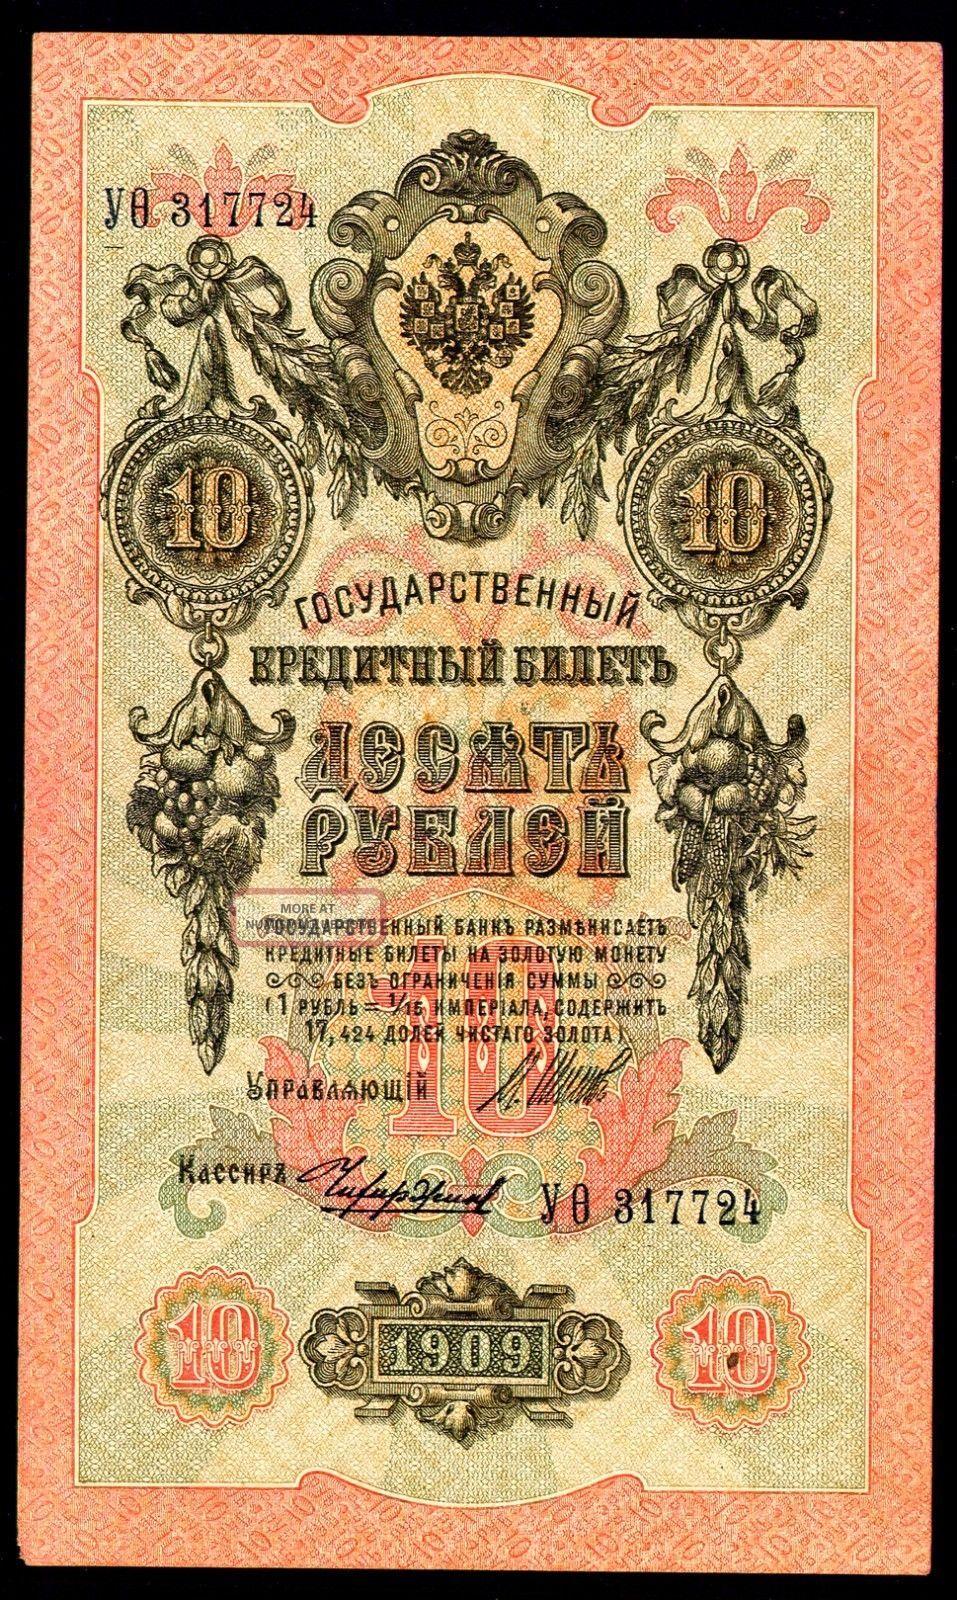 Russia 10 Rub 1909 Shipov - Chikhirzhin Soviet Governm УΘ 317724 Pick 11c Vf/xf Europe photo